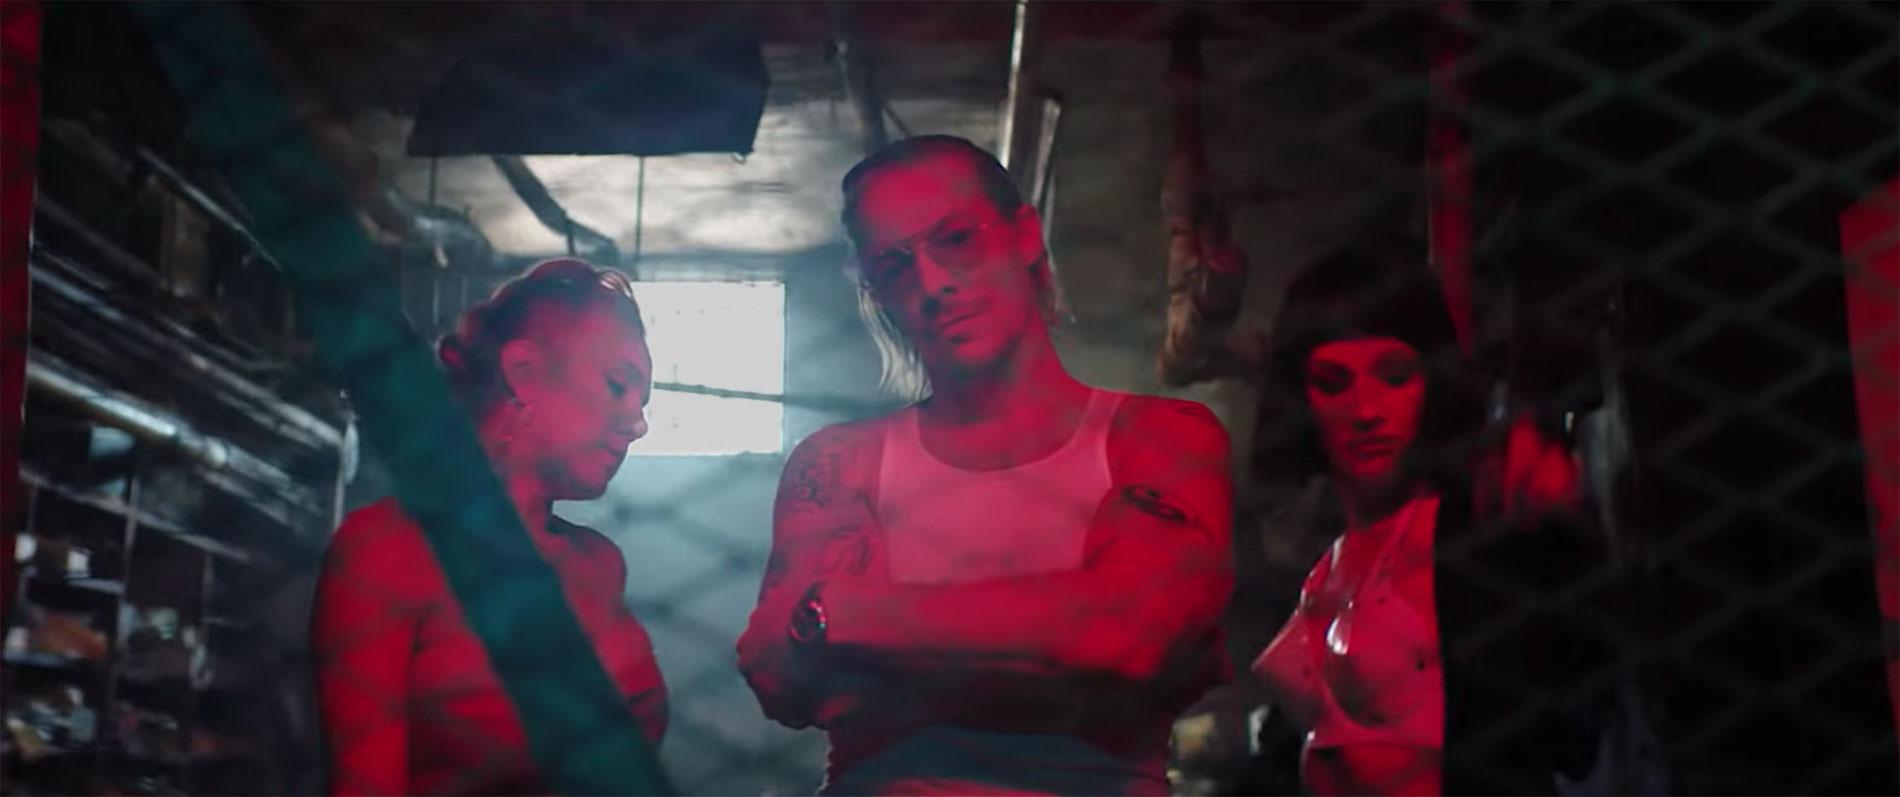 Diplo feat. French Montana, Lil Pump, Zhavia by Jason Koenig